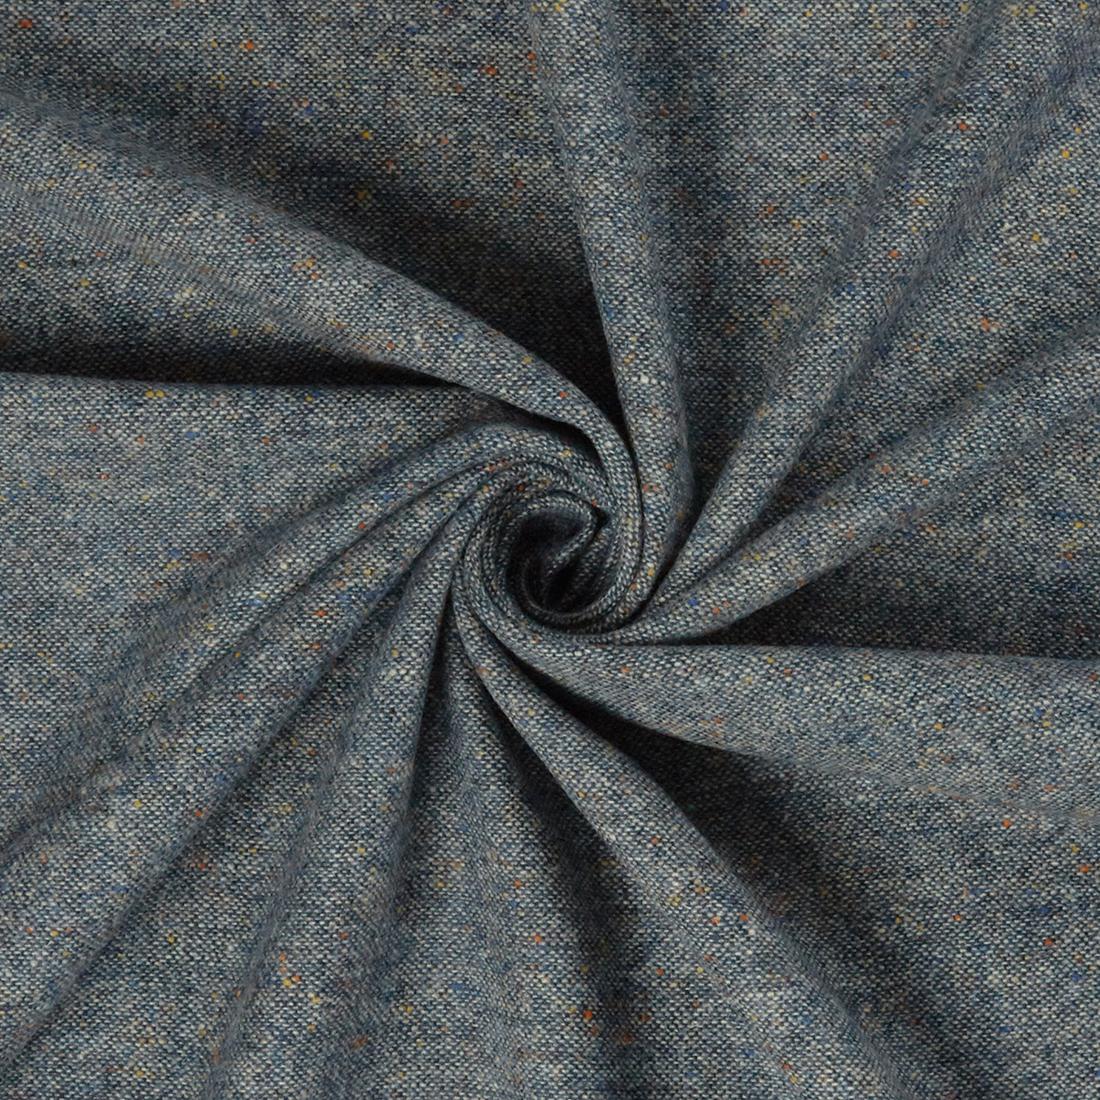 Classic Tweed Sky Dress Fabric